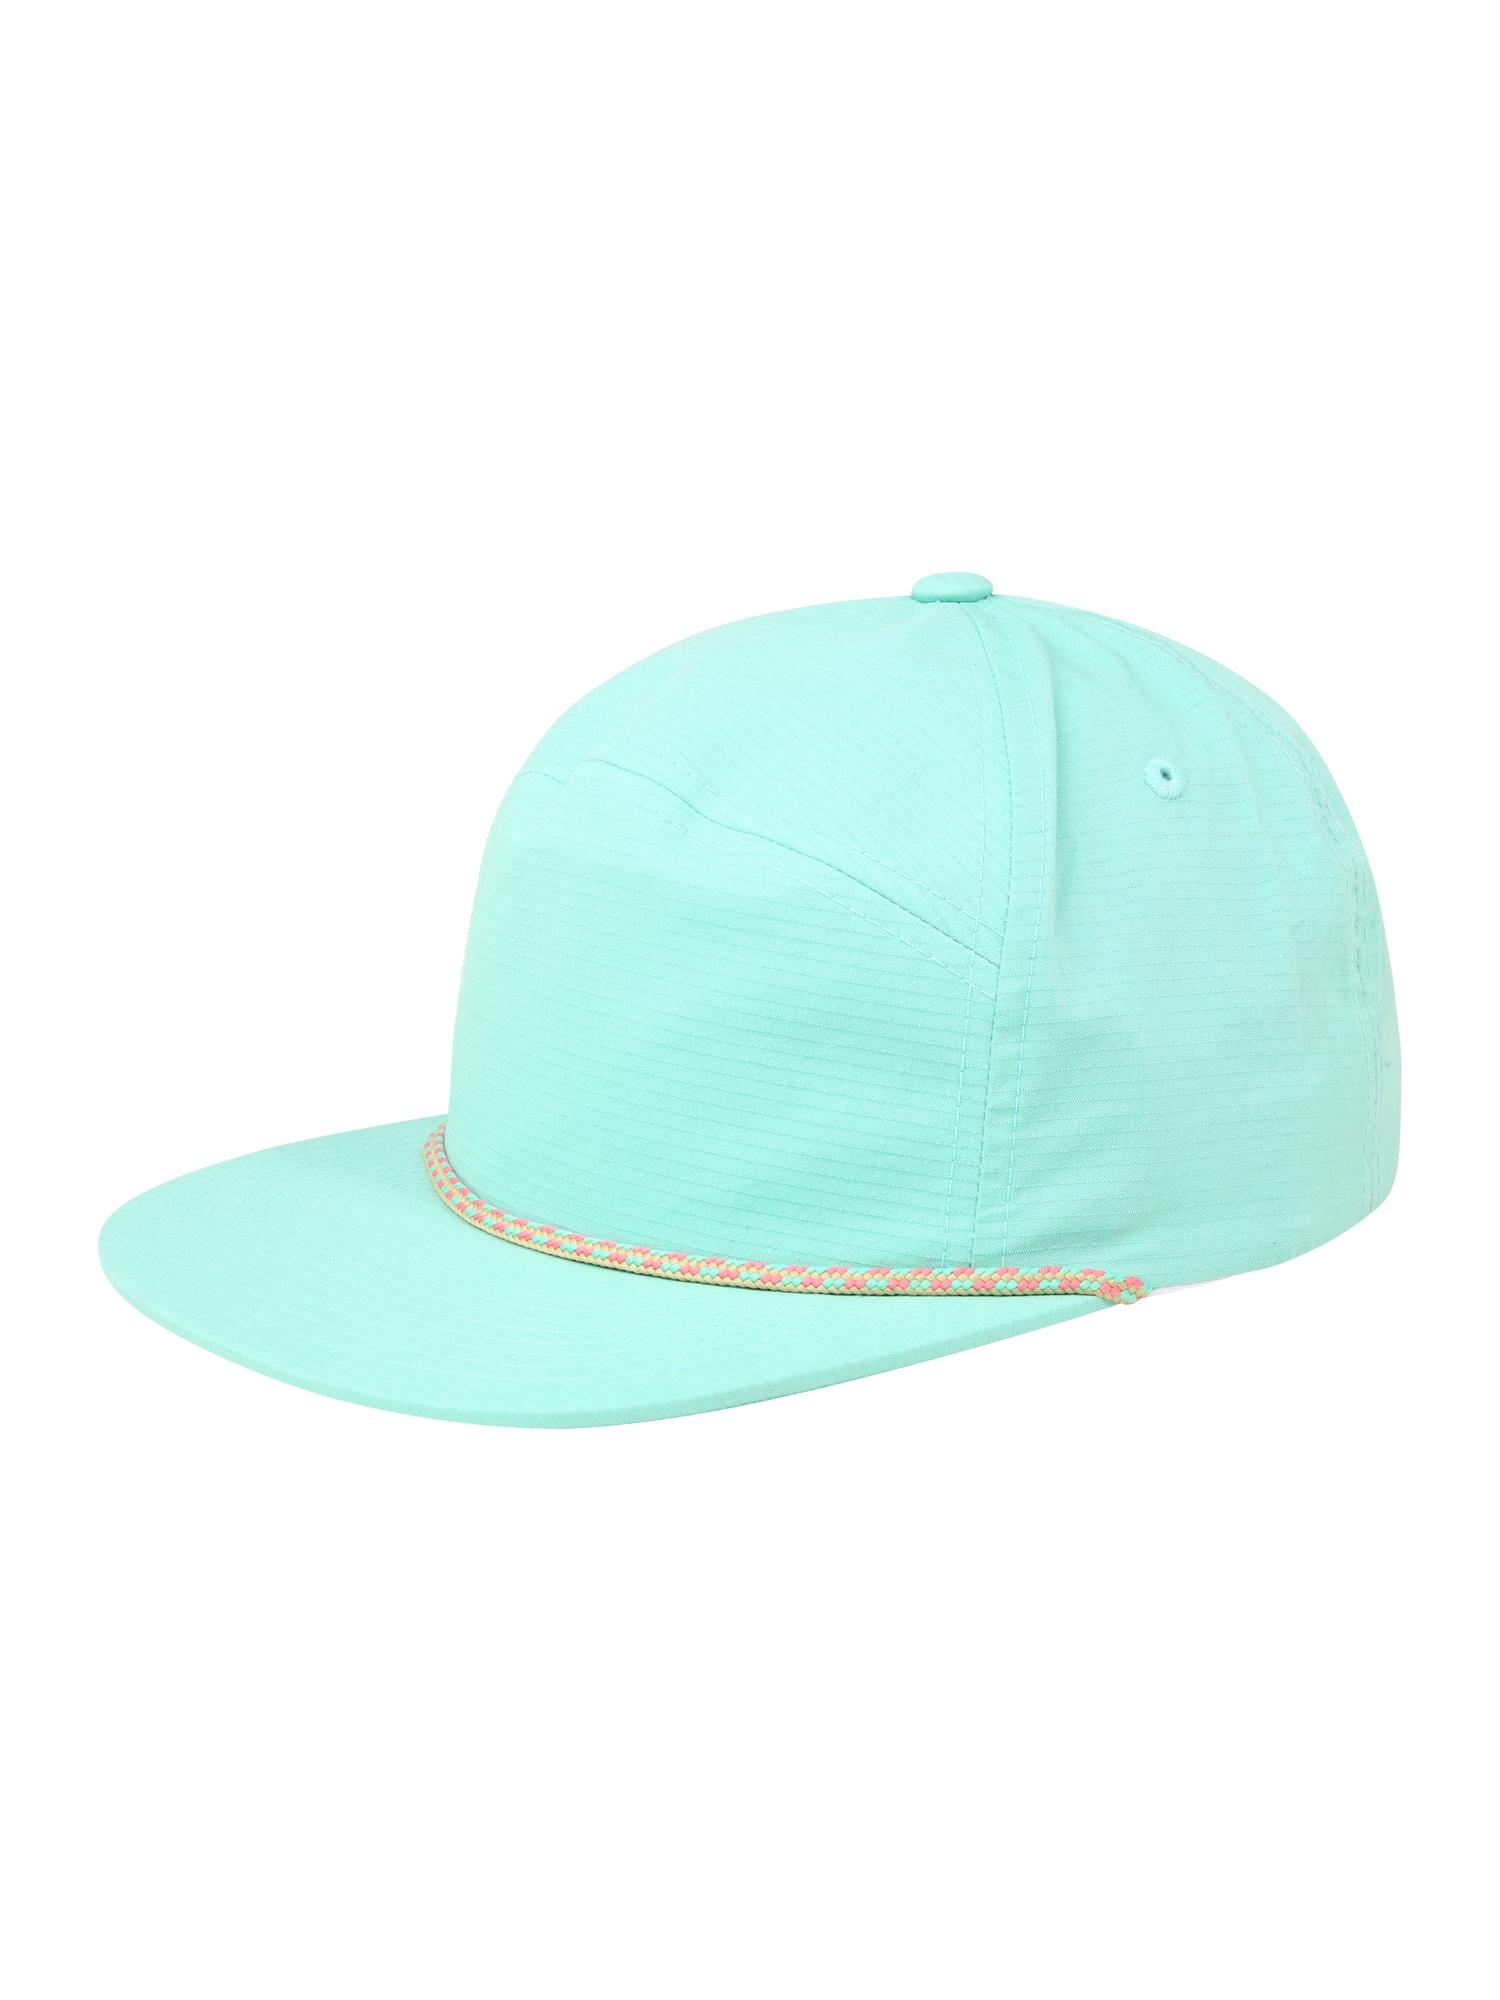 Čepice Color Braid Jockey Cap mátová Flexfit